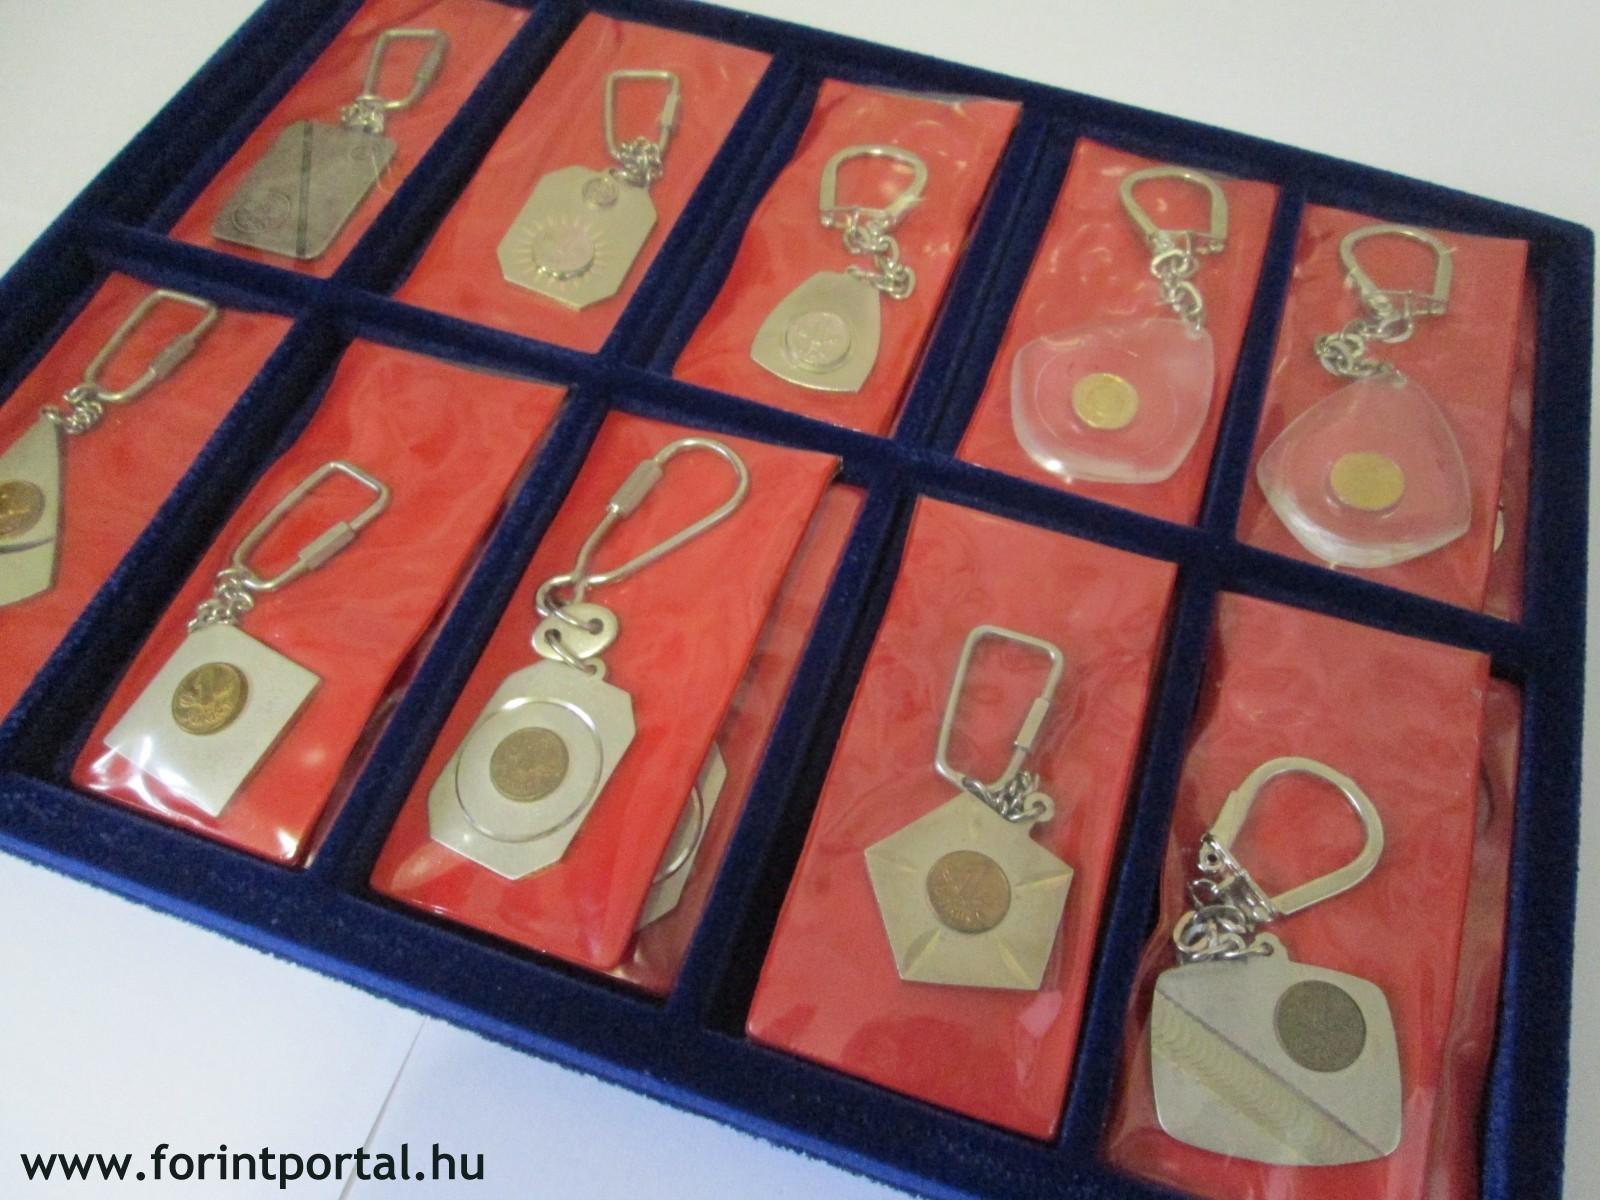 http://www.forintportal.hu/hirek/mini-1-forintos-kulcstartok/mini-1-forintos-kulcstartok-apv-allami-penzvero-regi-kulcstarto-1ft_05.jpg